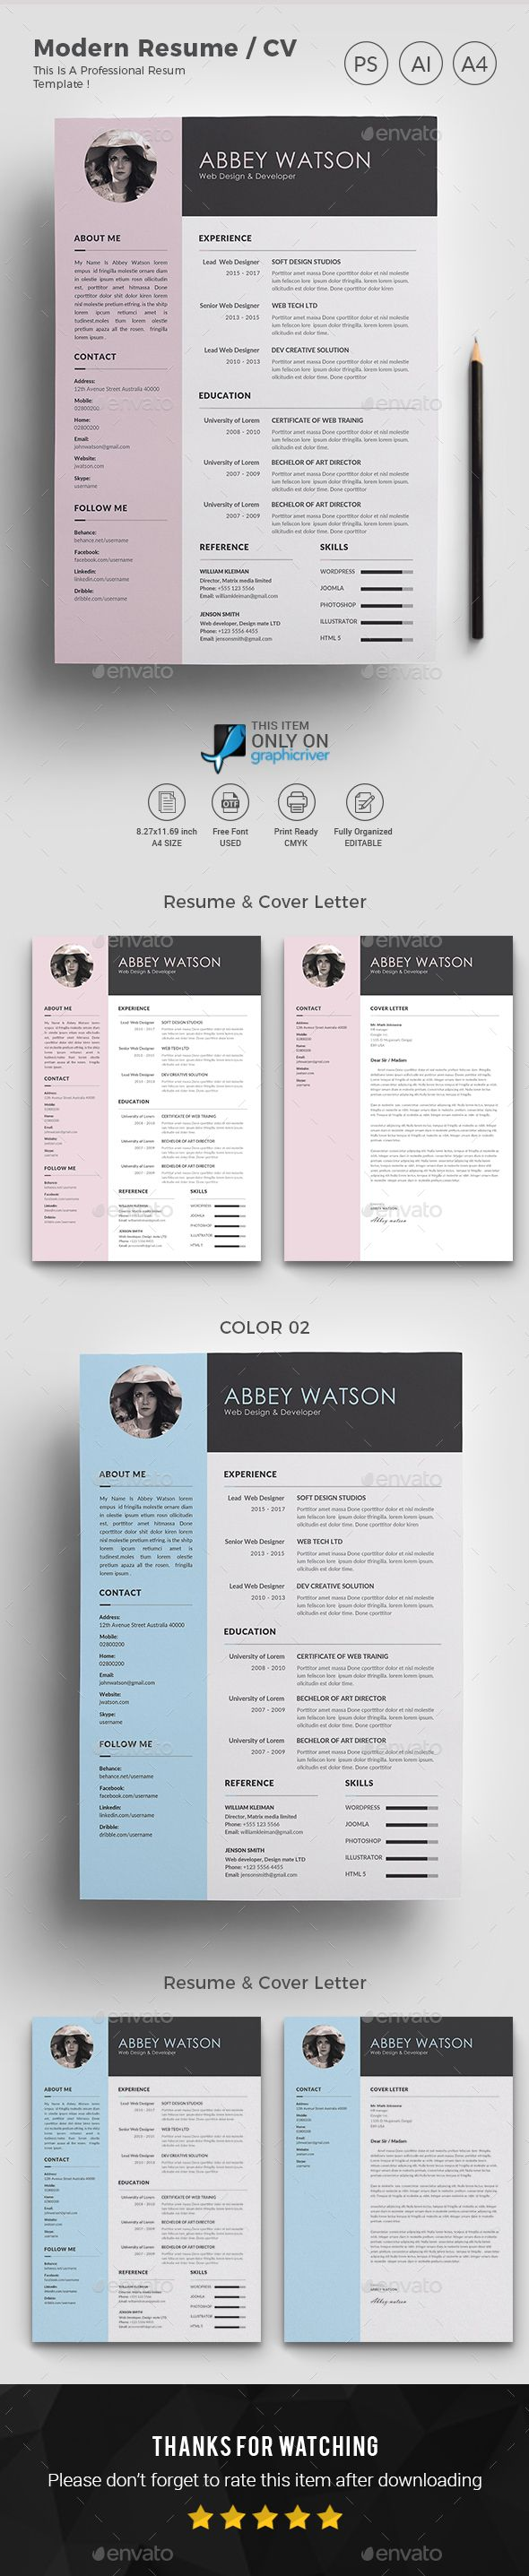 Resume Templates : Resume Template PSD, AI Illustrator ...